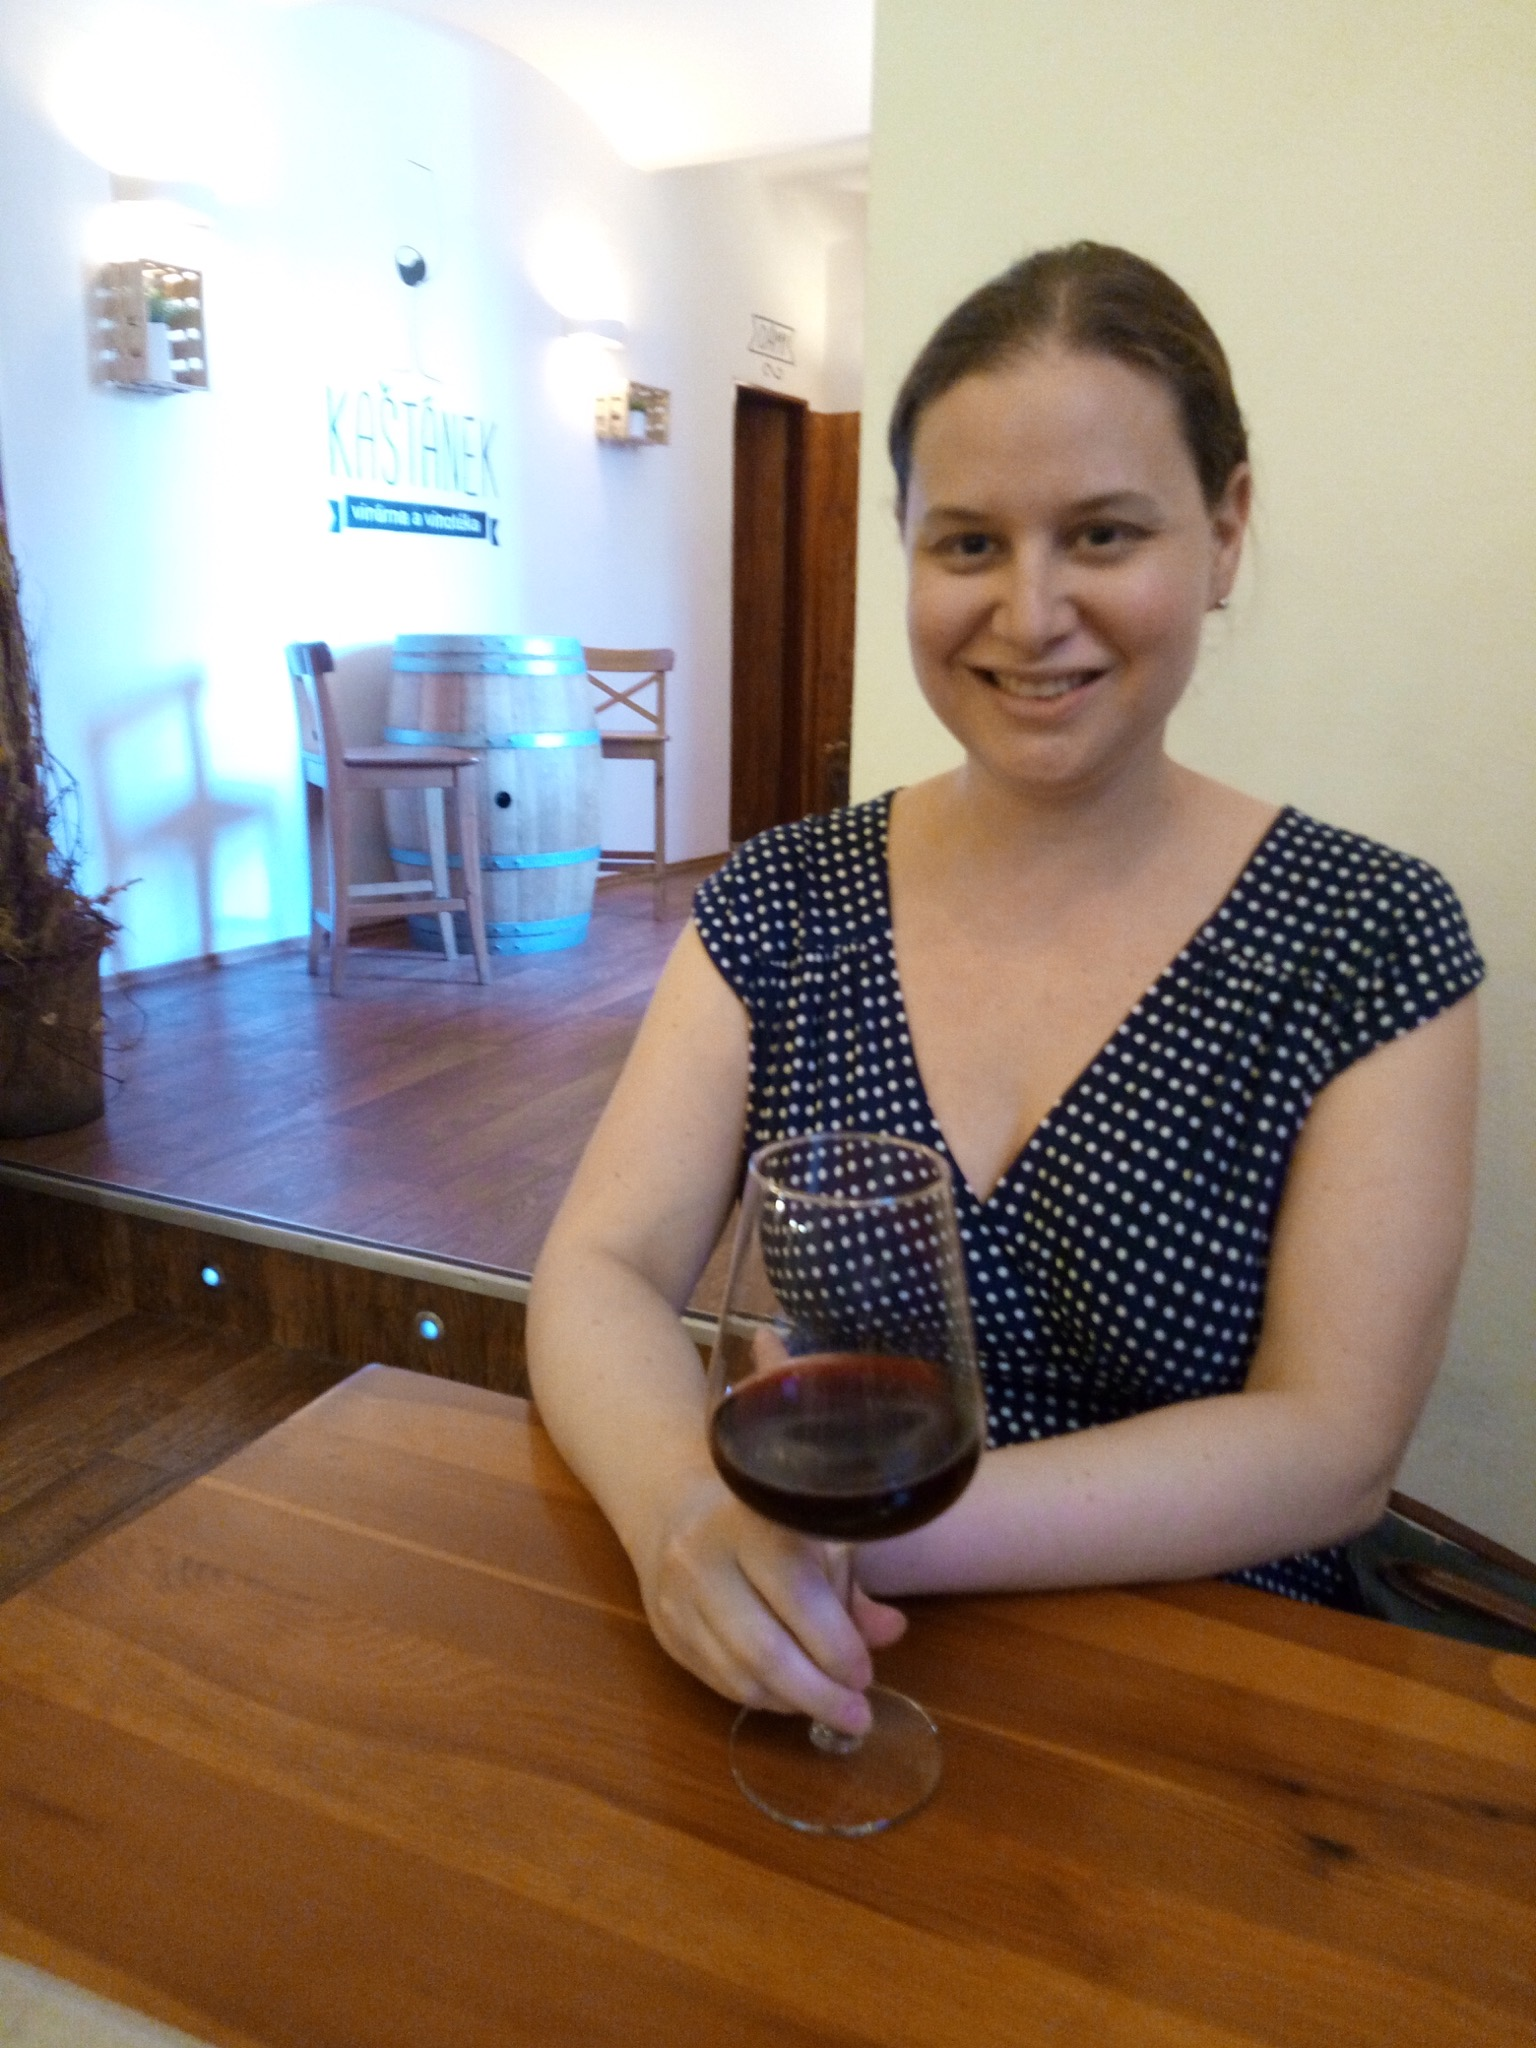 Moravian wine, Olomouc, Czech Republic